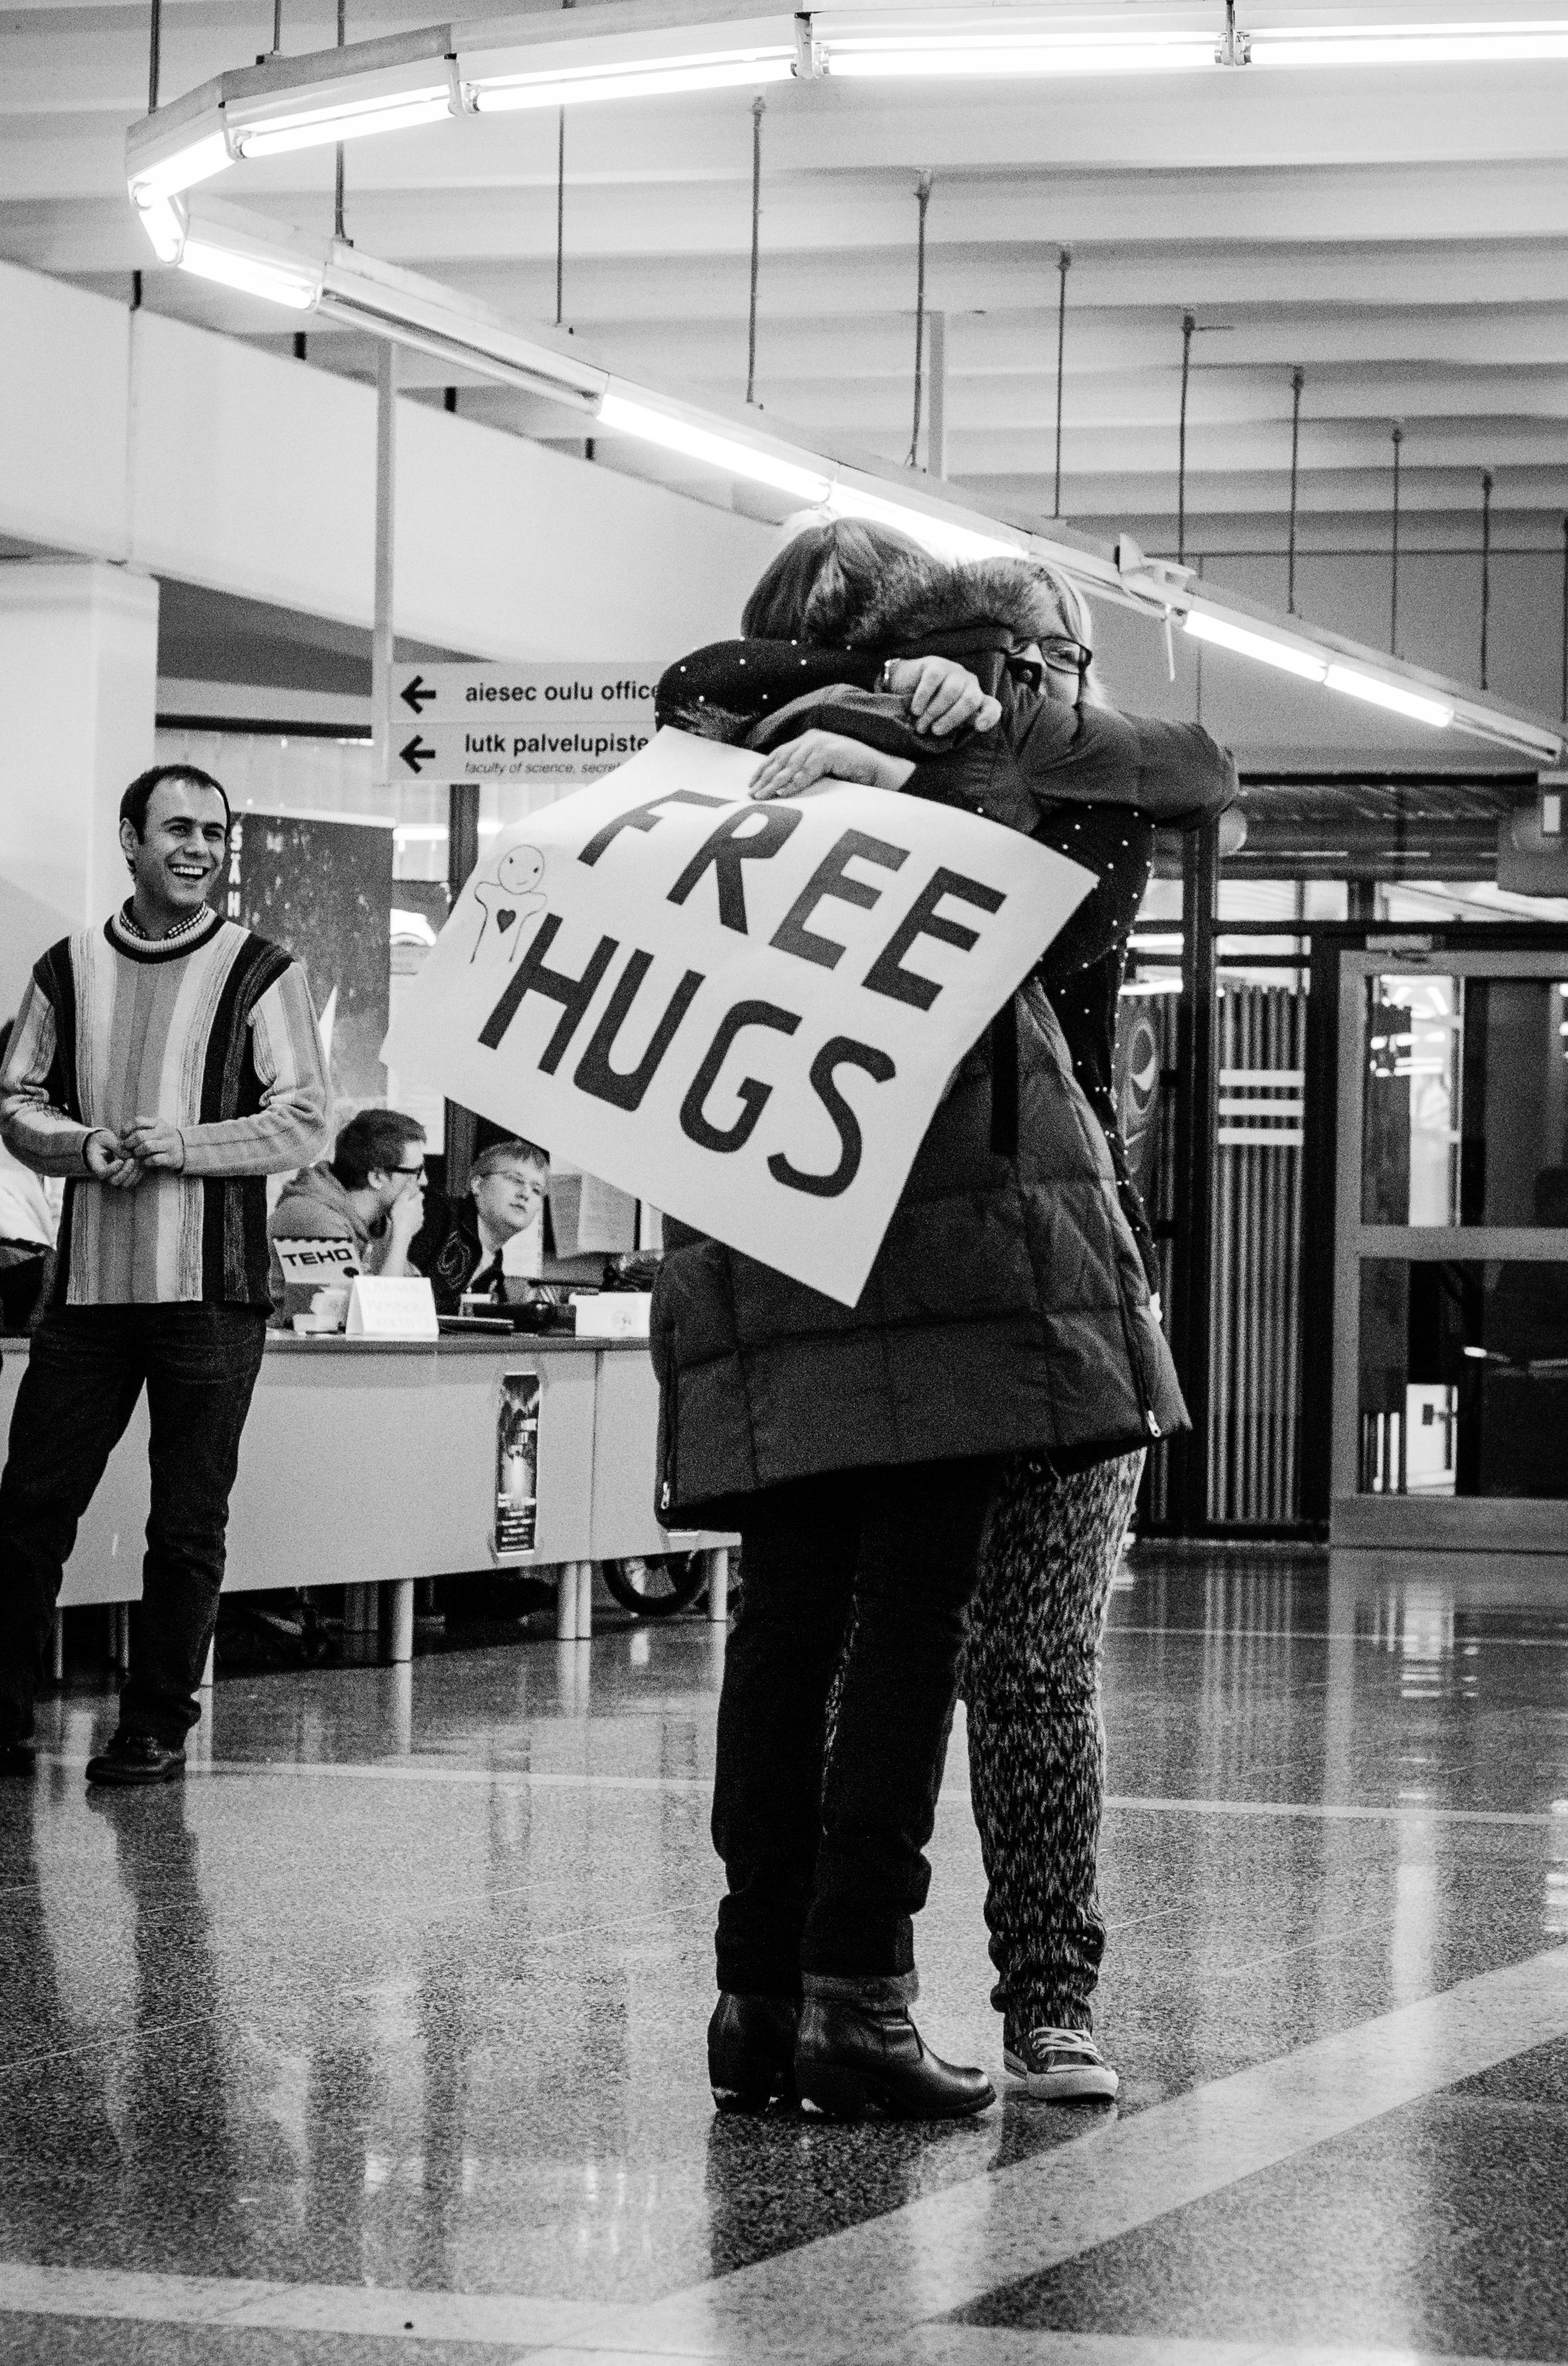 Day 021: Free hugs